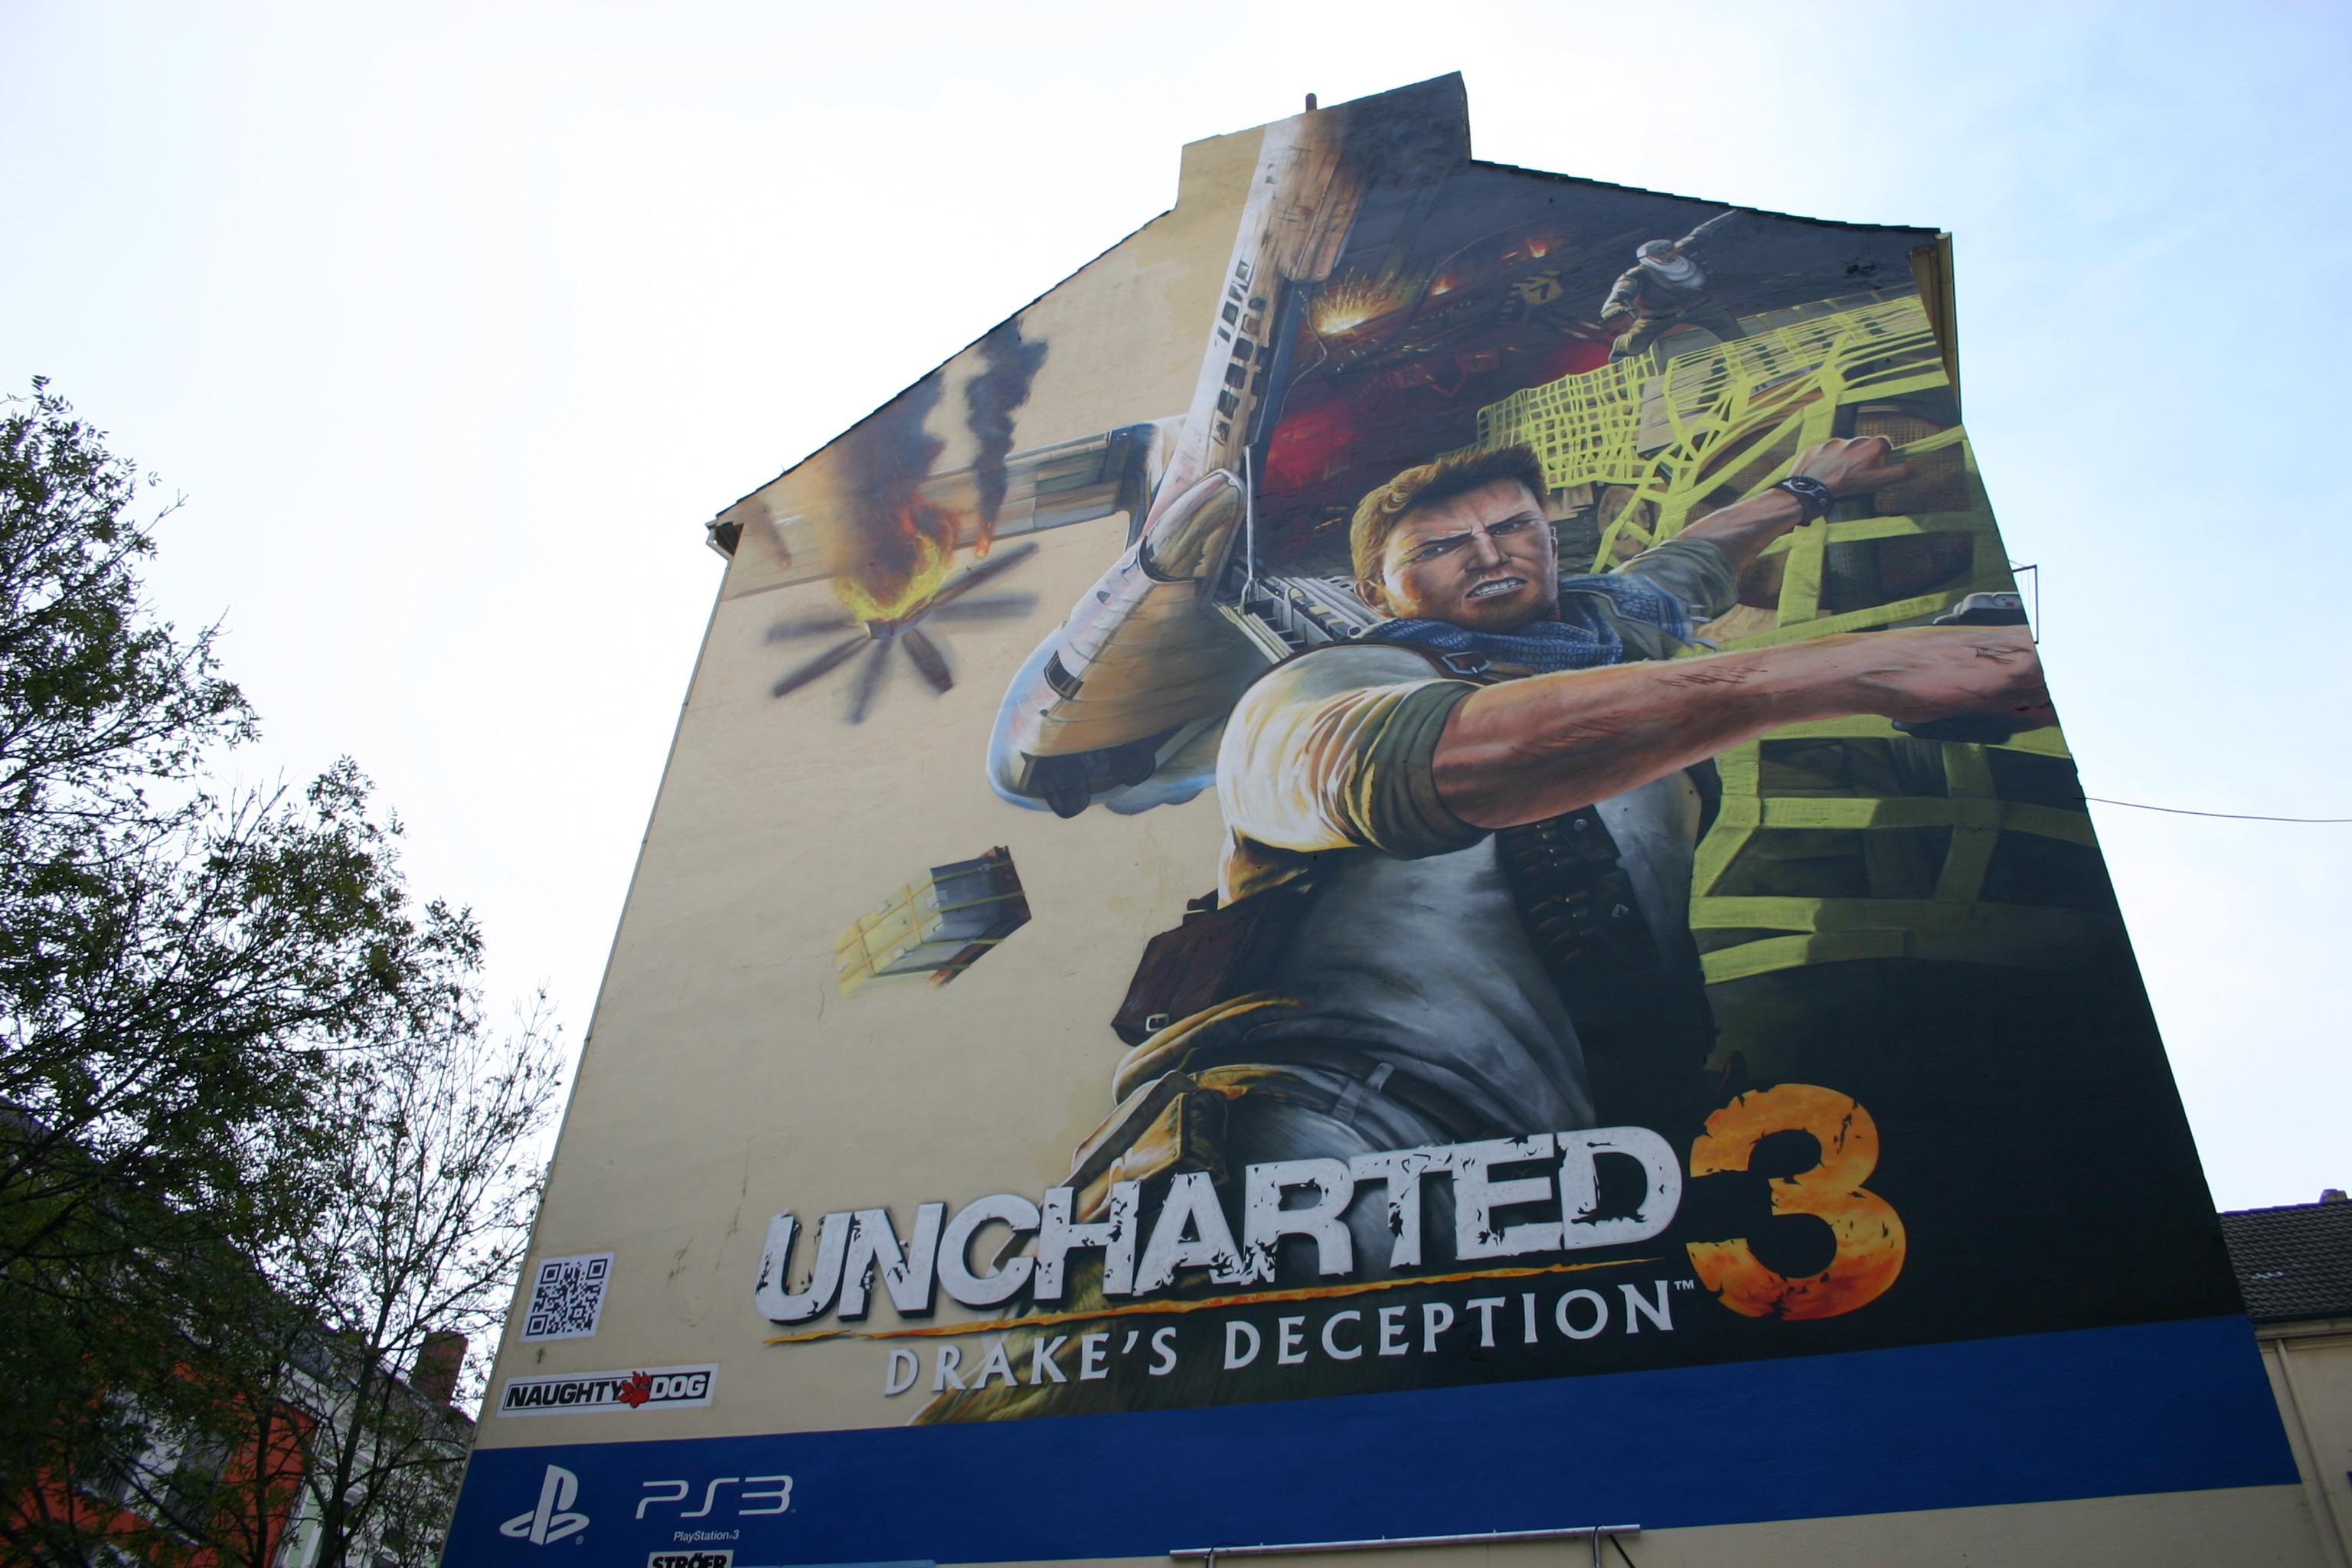 Bild von Graffiti-Projekt Uncharted 3